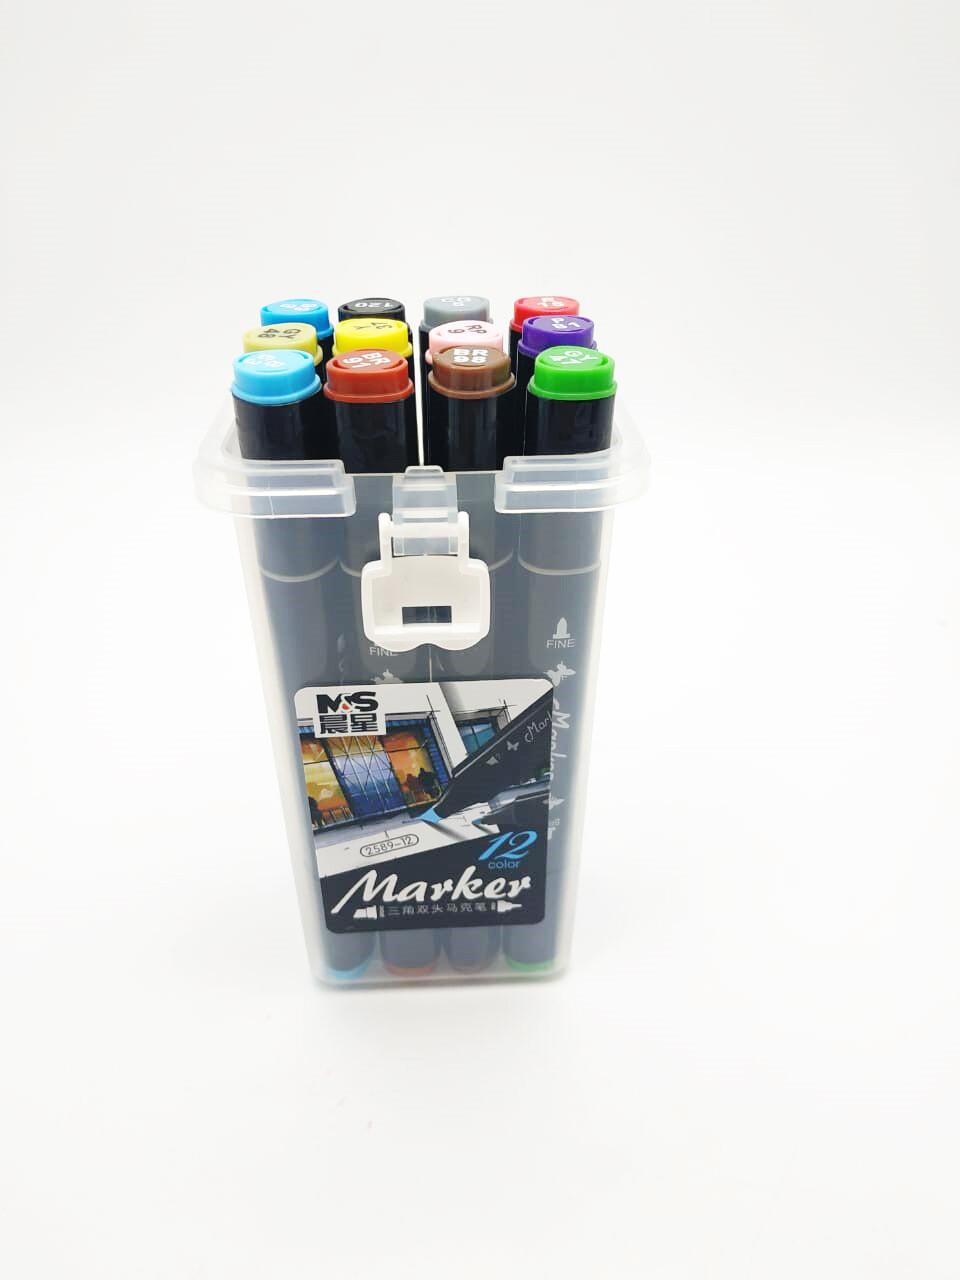 Набор маркеров двухсторонних для скетчинга 12 цветов (2 пера)